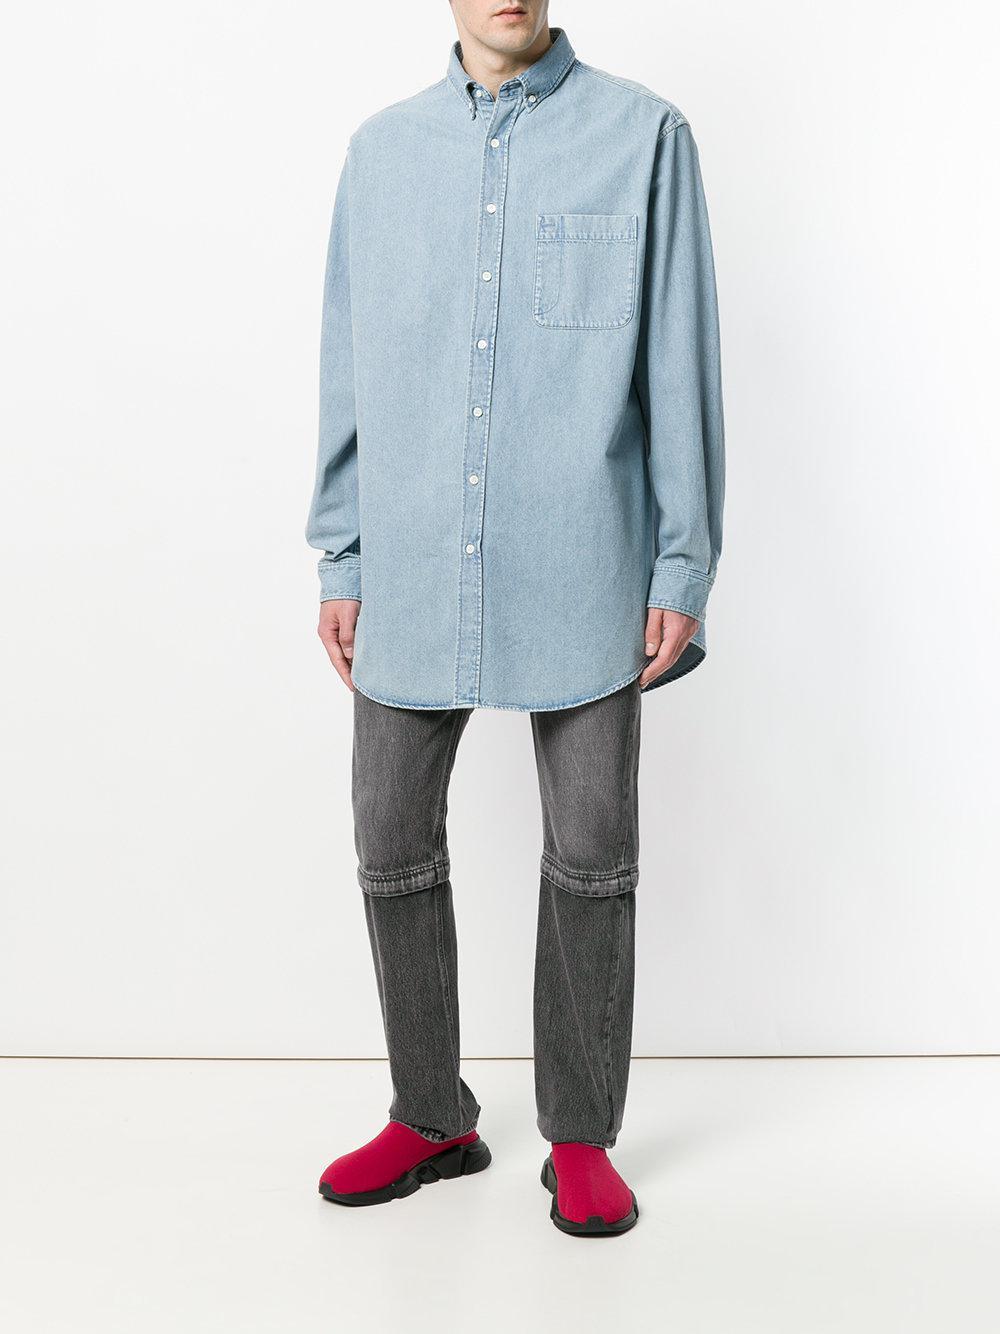 86874ecc Balenciaga Bal Big Denim Shirt in Blue for Men - Lyst